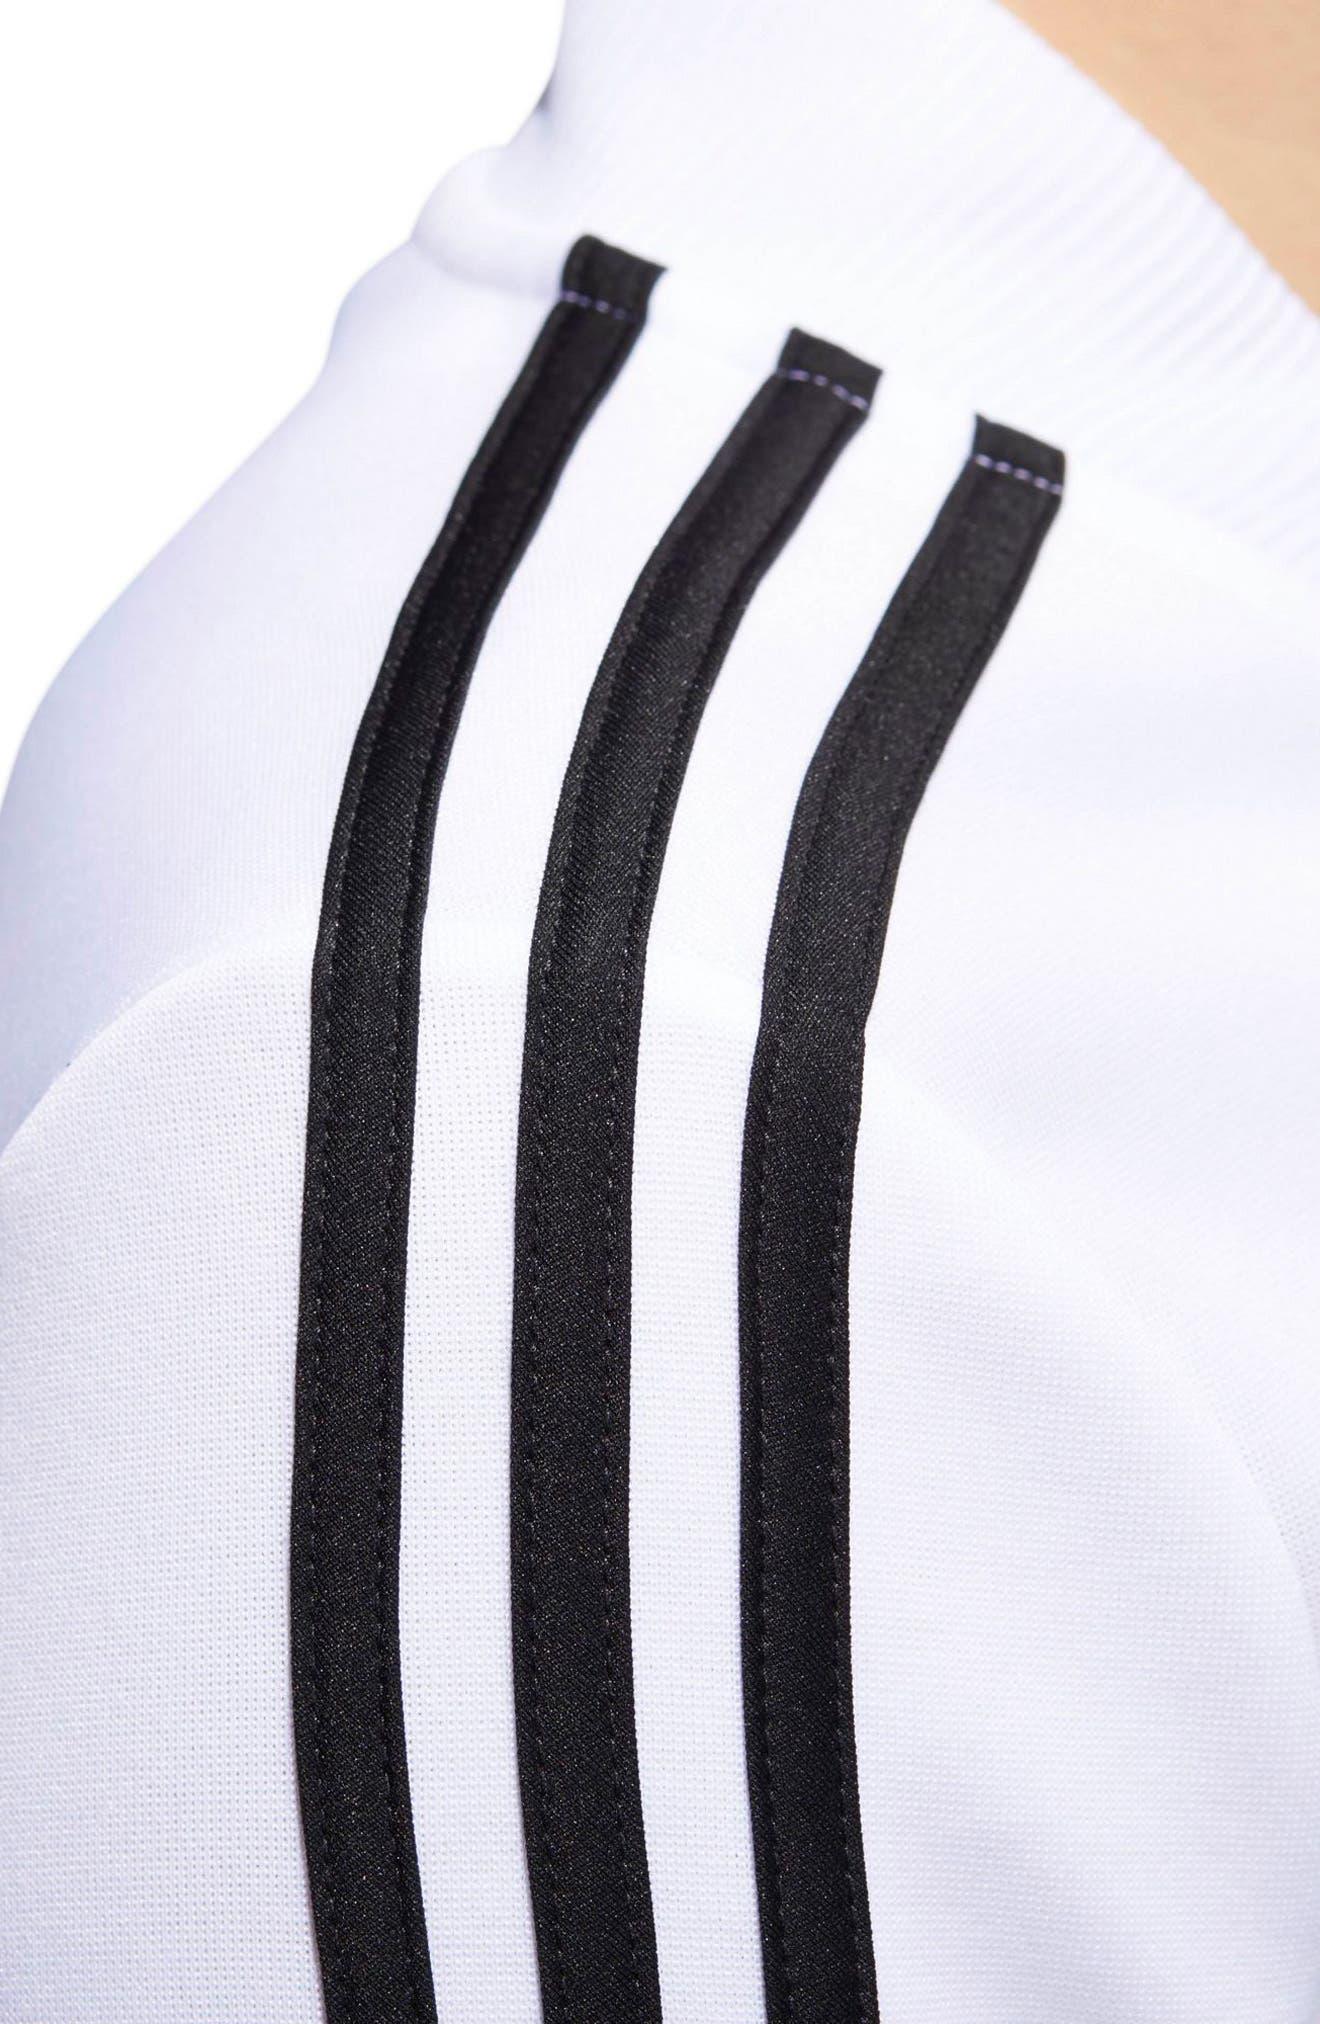 Tricot Snap It Track Jacket,                             Alternate thumbnail 7, color,                             White/ Black